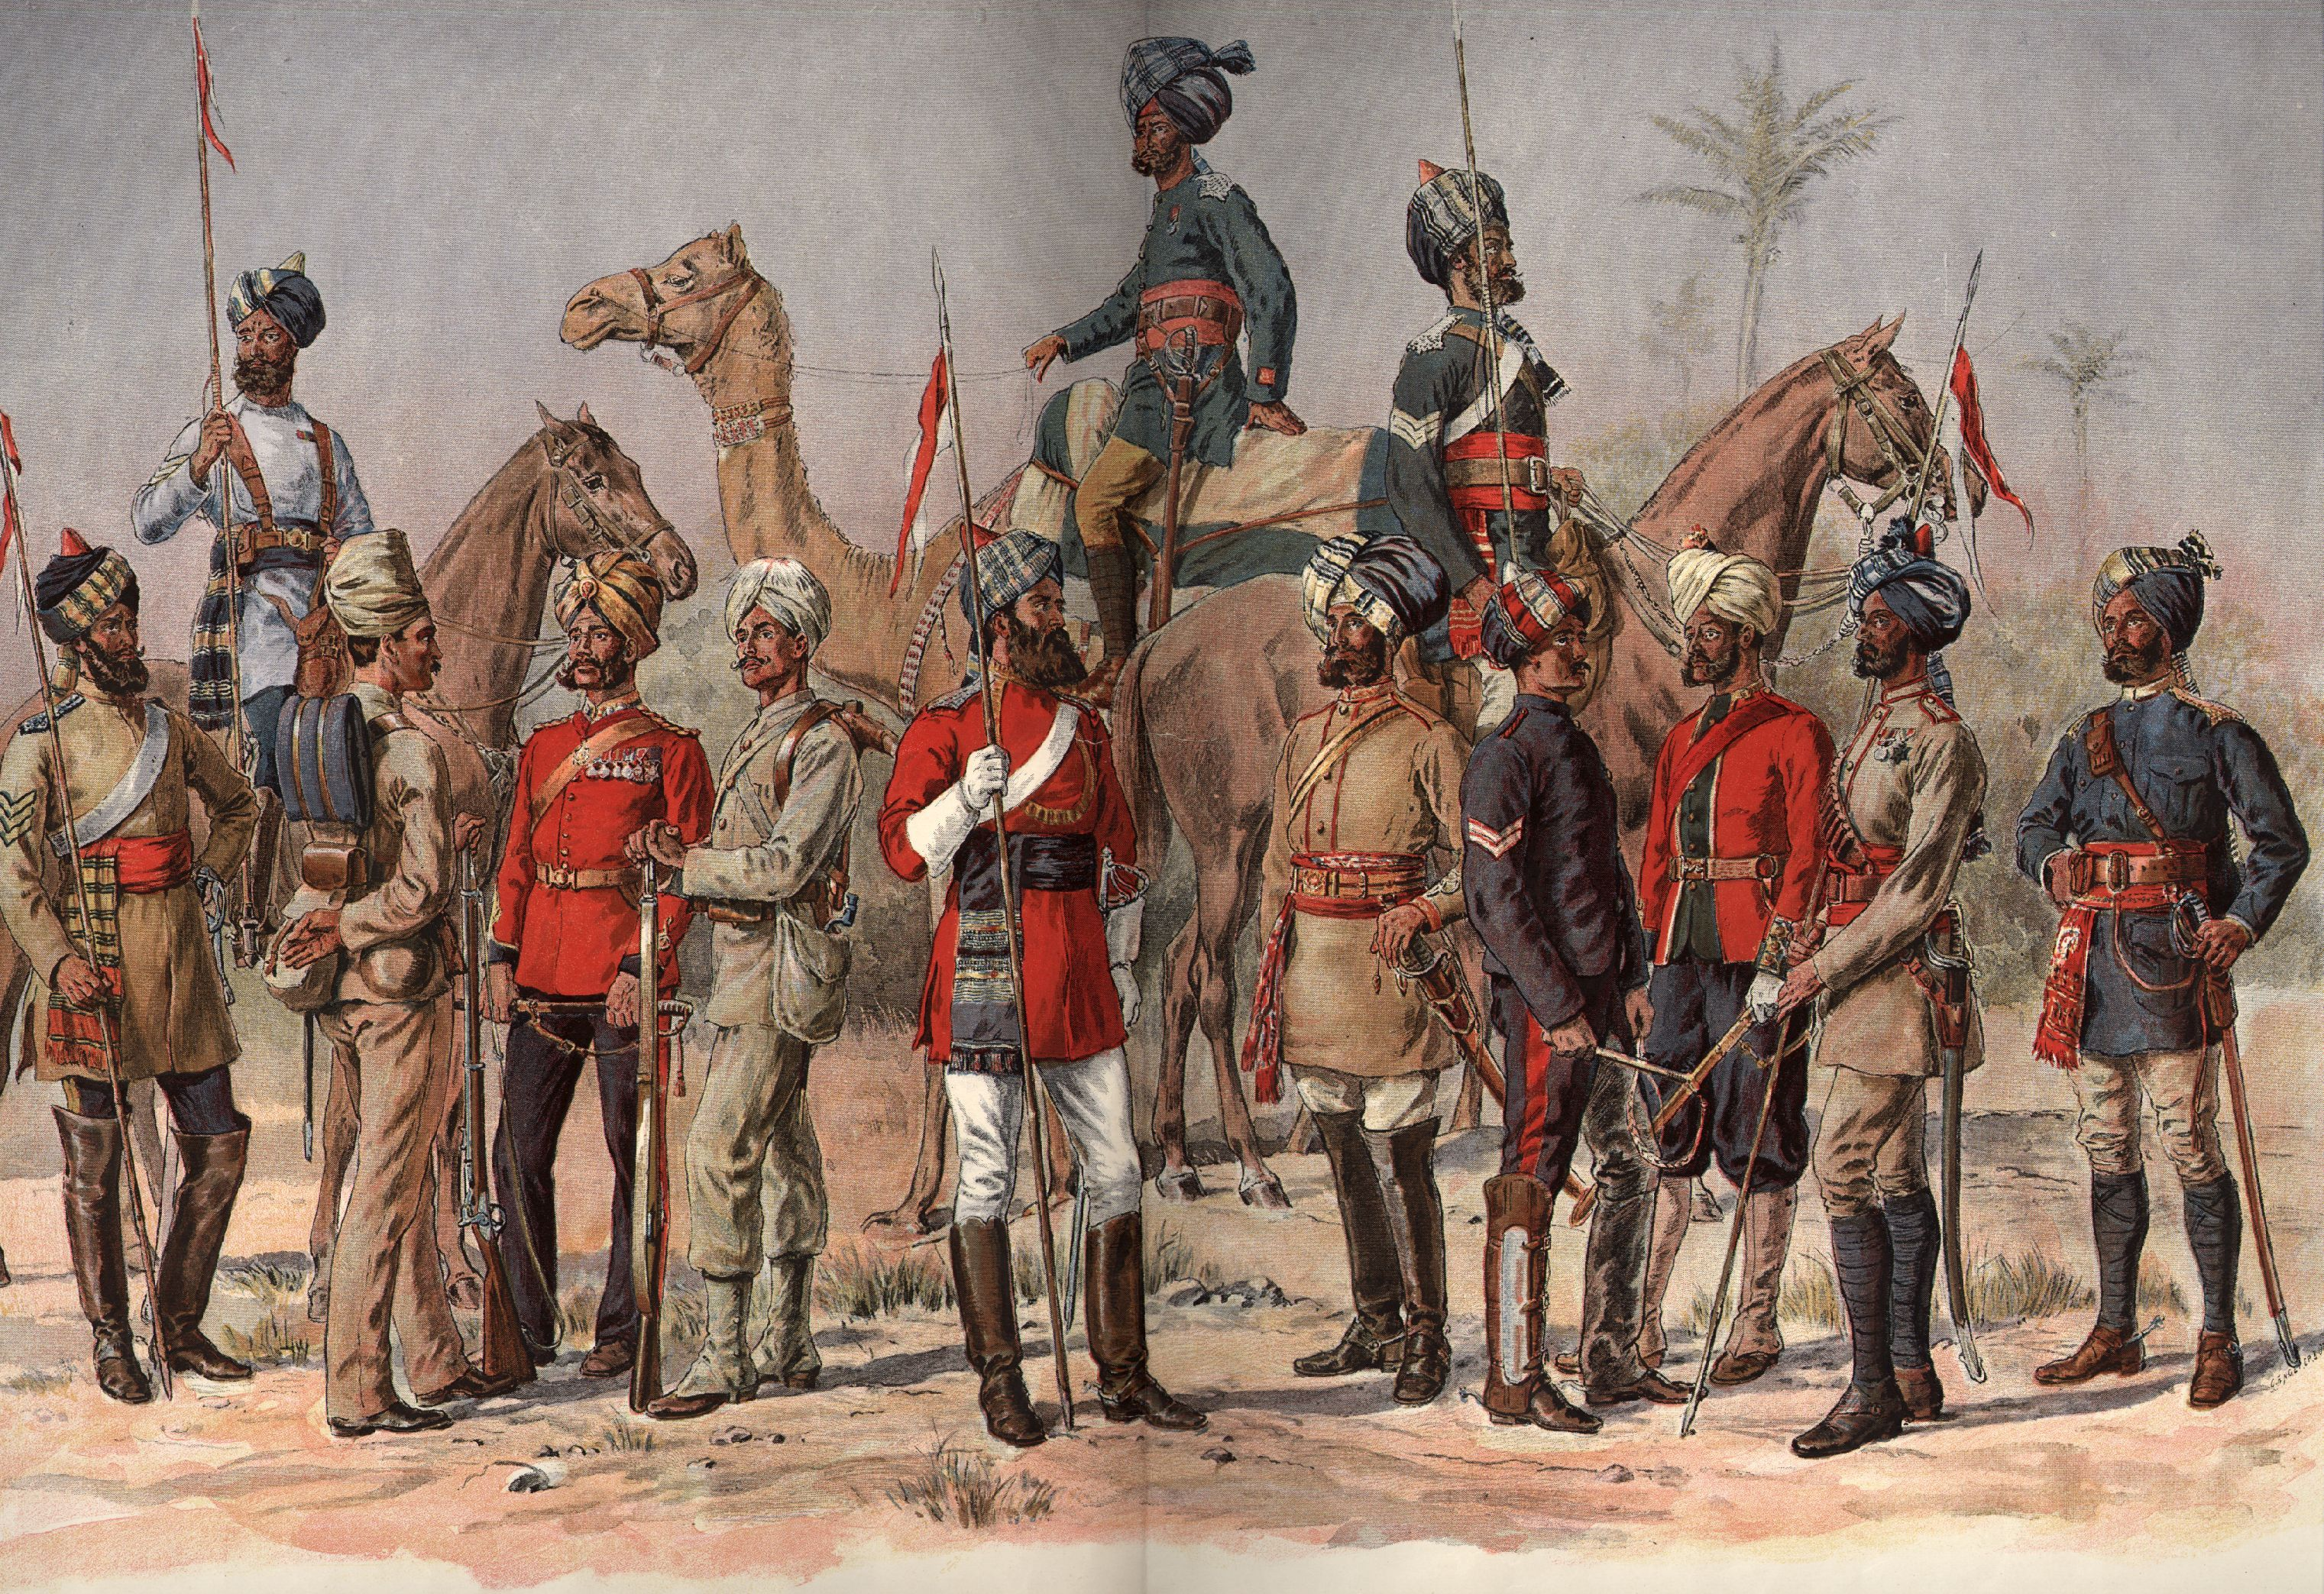 Sepoys of the Madras Army